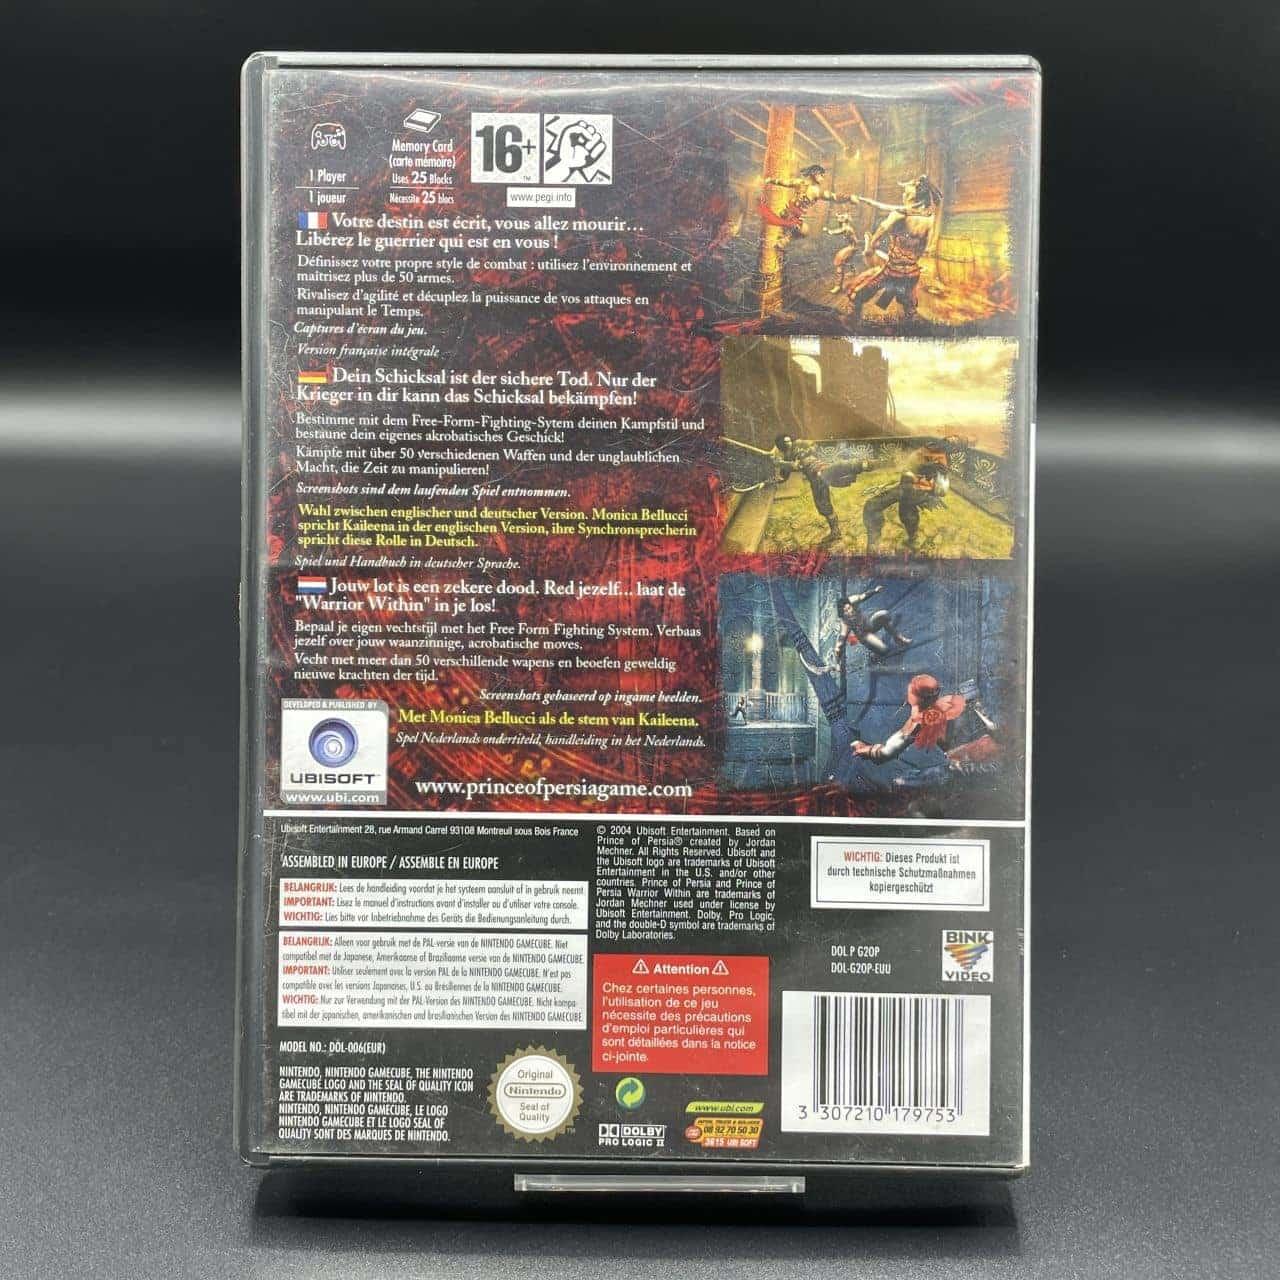 GC Prince of Persia: Warrior Within (Komplett) (Gebrauchsspuren) Nintendo GameCube